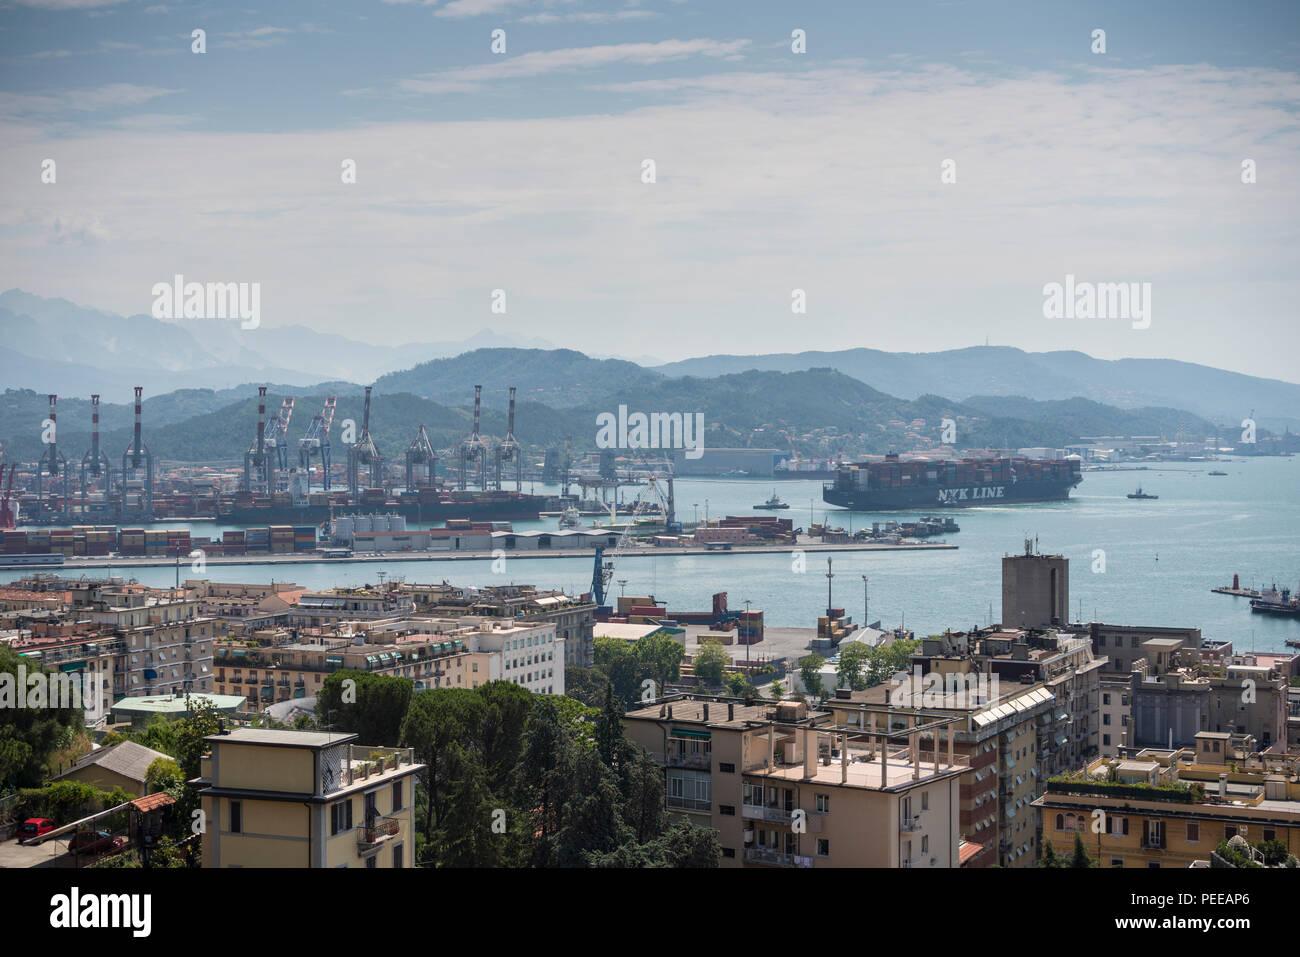 NYK LINE container ship approaching La Spezia Port, Liguria, Italy - Stock Image